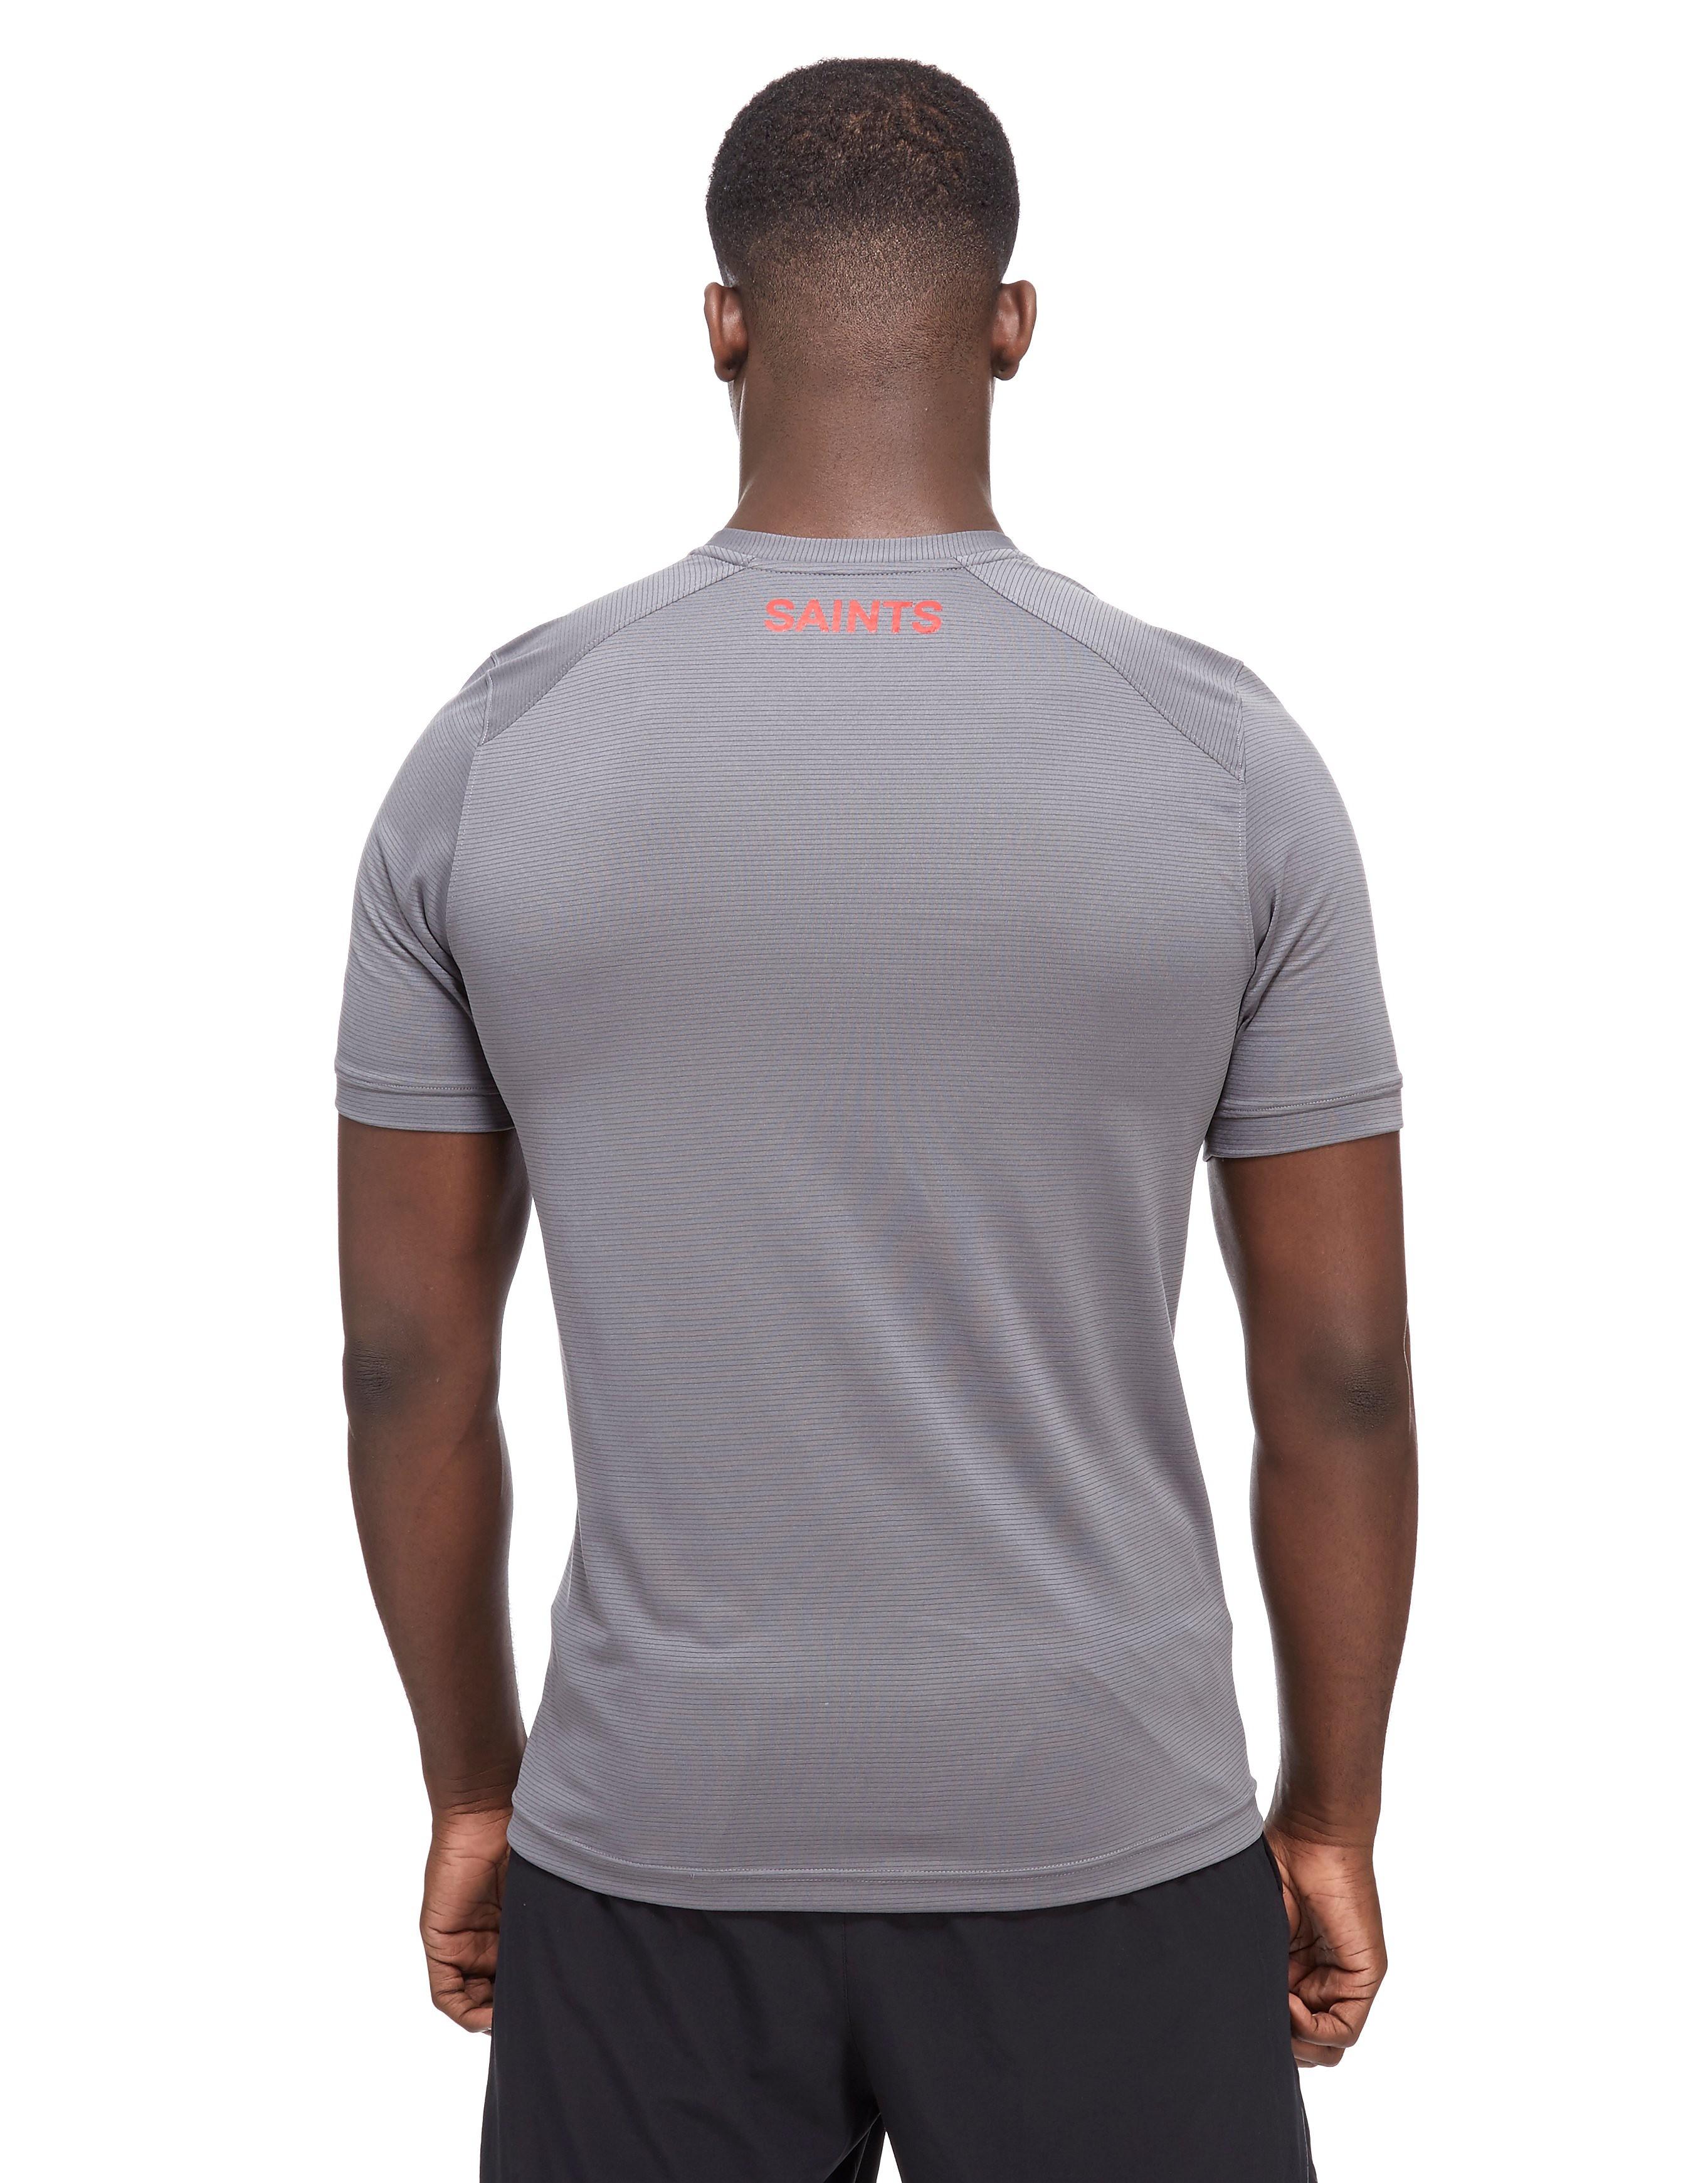 Under Armour Southampton FC 2017 Training Shirt